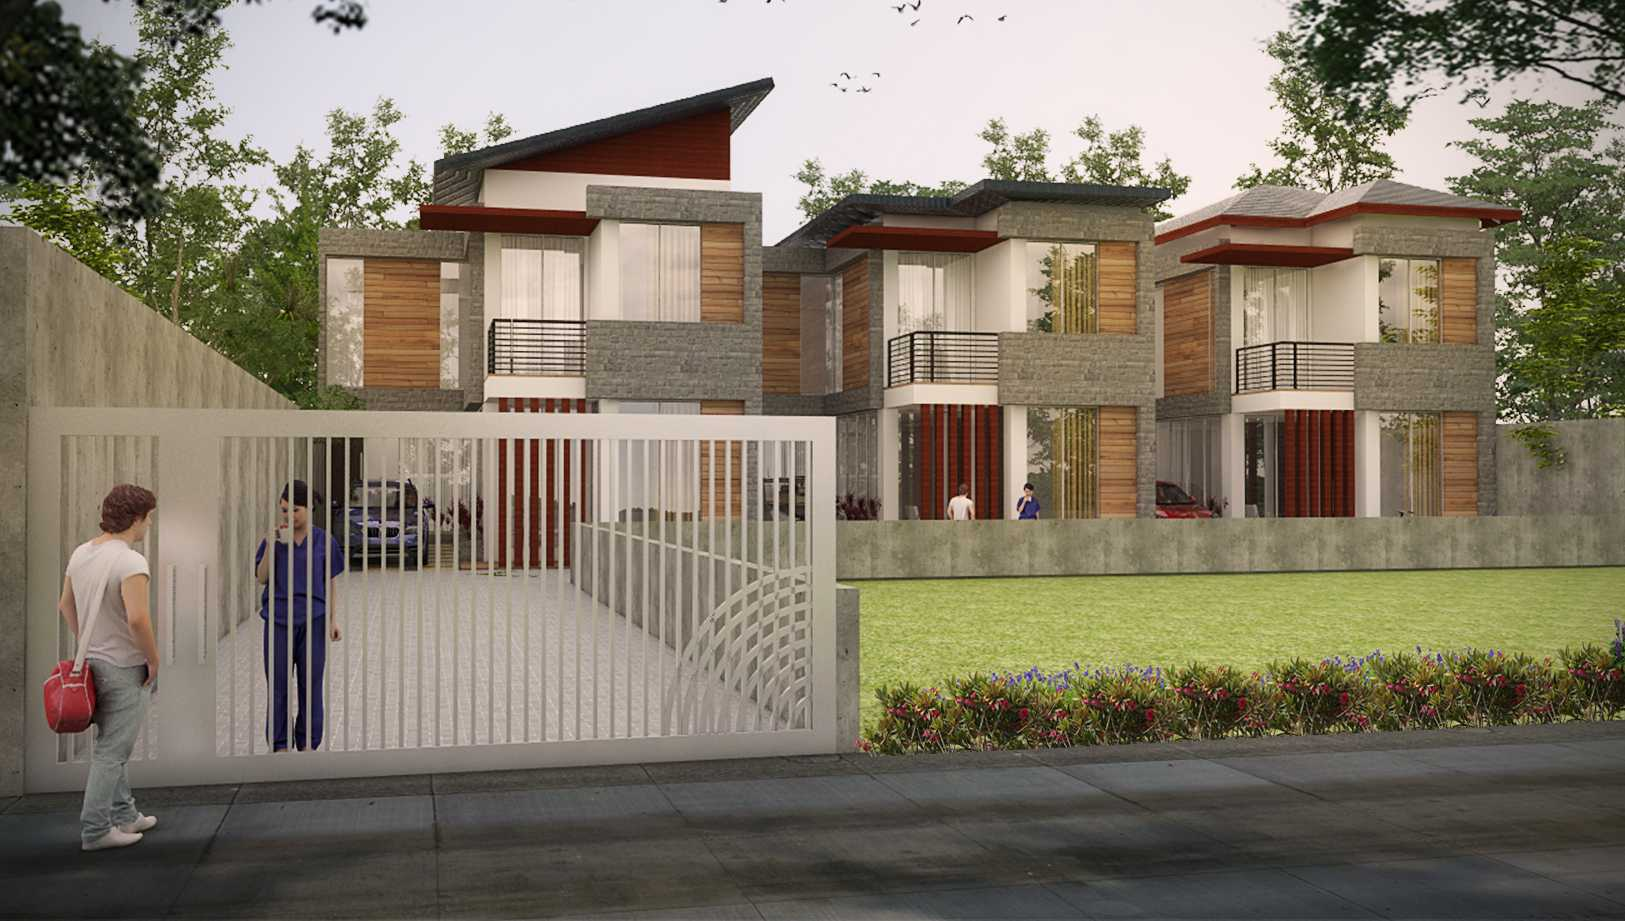 Sabio Design Cijagra House, Bandung Cijagra, Kec. Lengkong, Kota Bandung, Jawa Barat, Indonesia Cijagra, Kec. Lengkong, Kota Bandung, Jawa Barat, Indonesia Sabio-Design-Cijagra-House-Bandung  115297